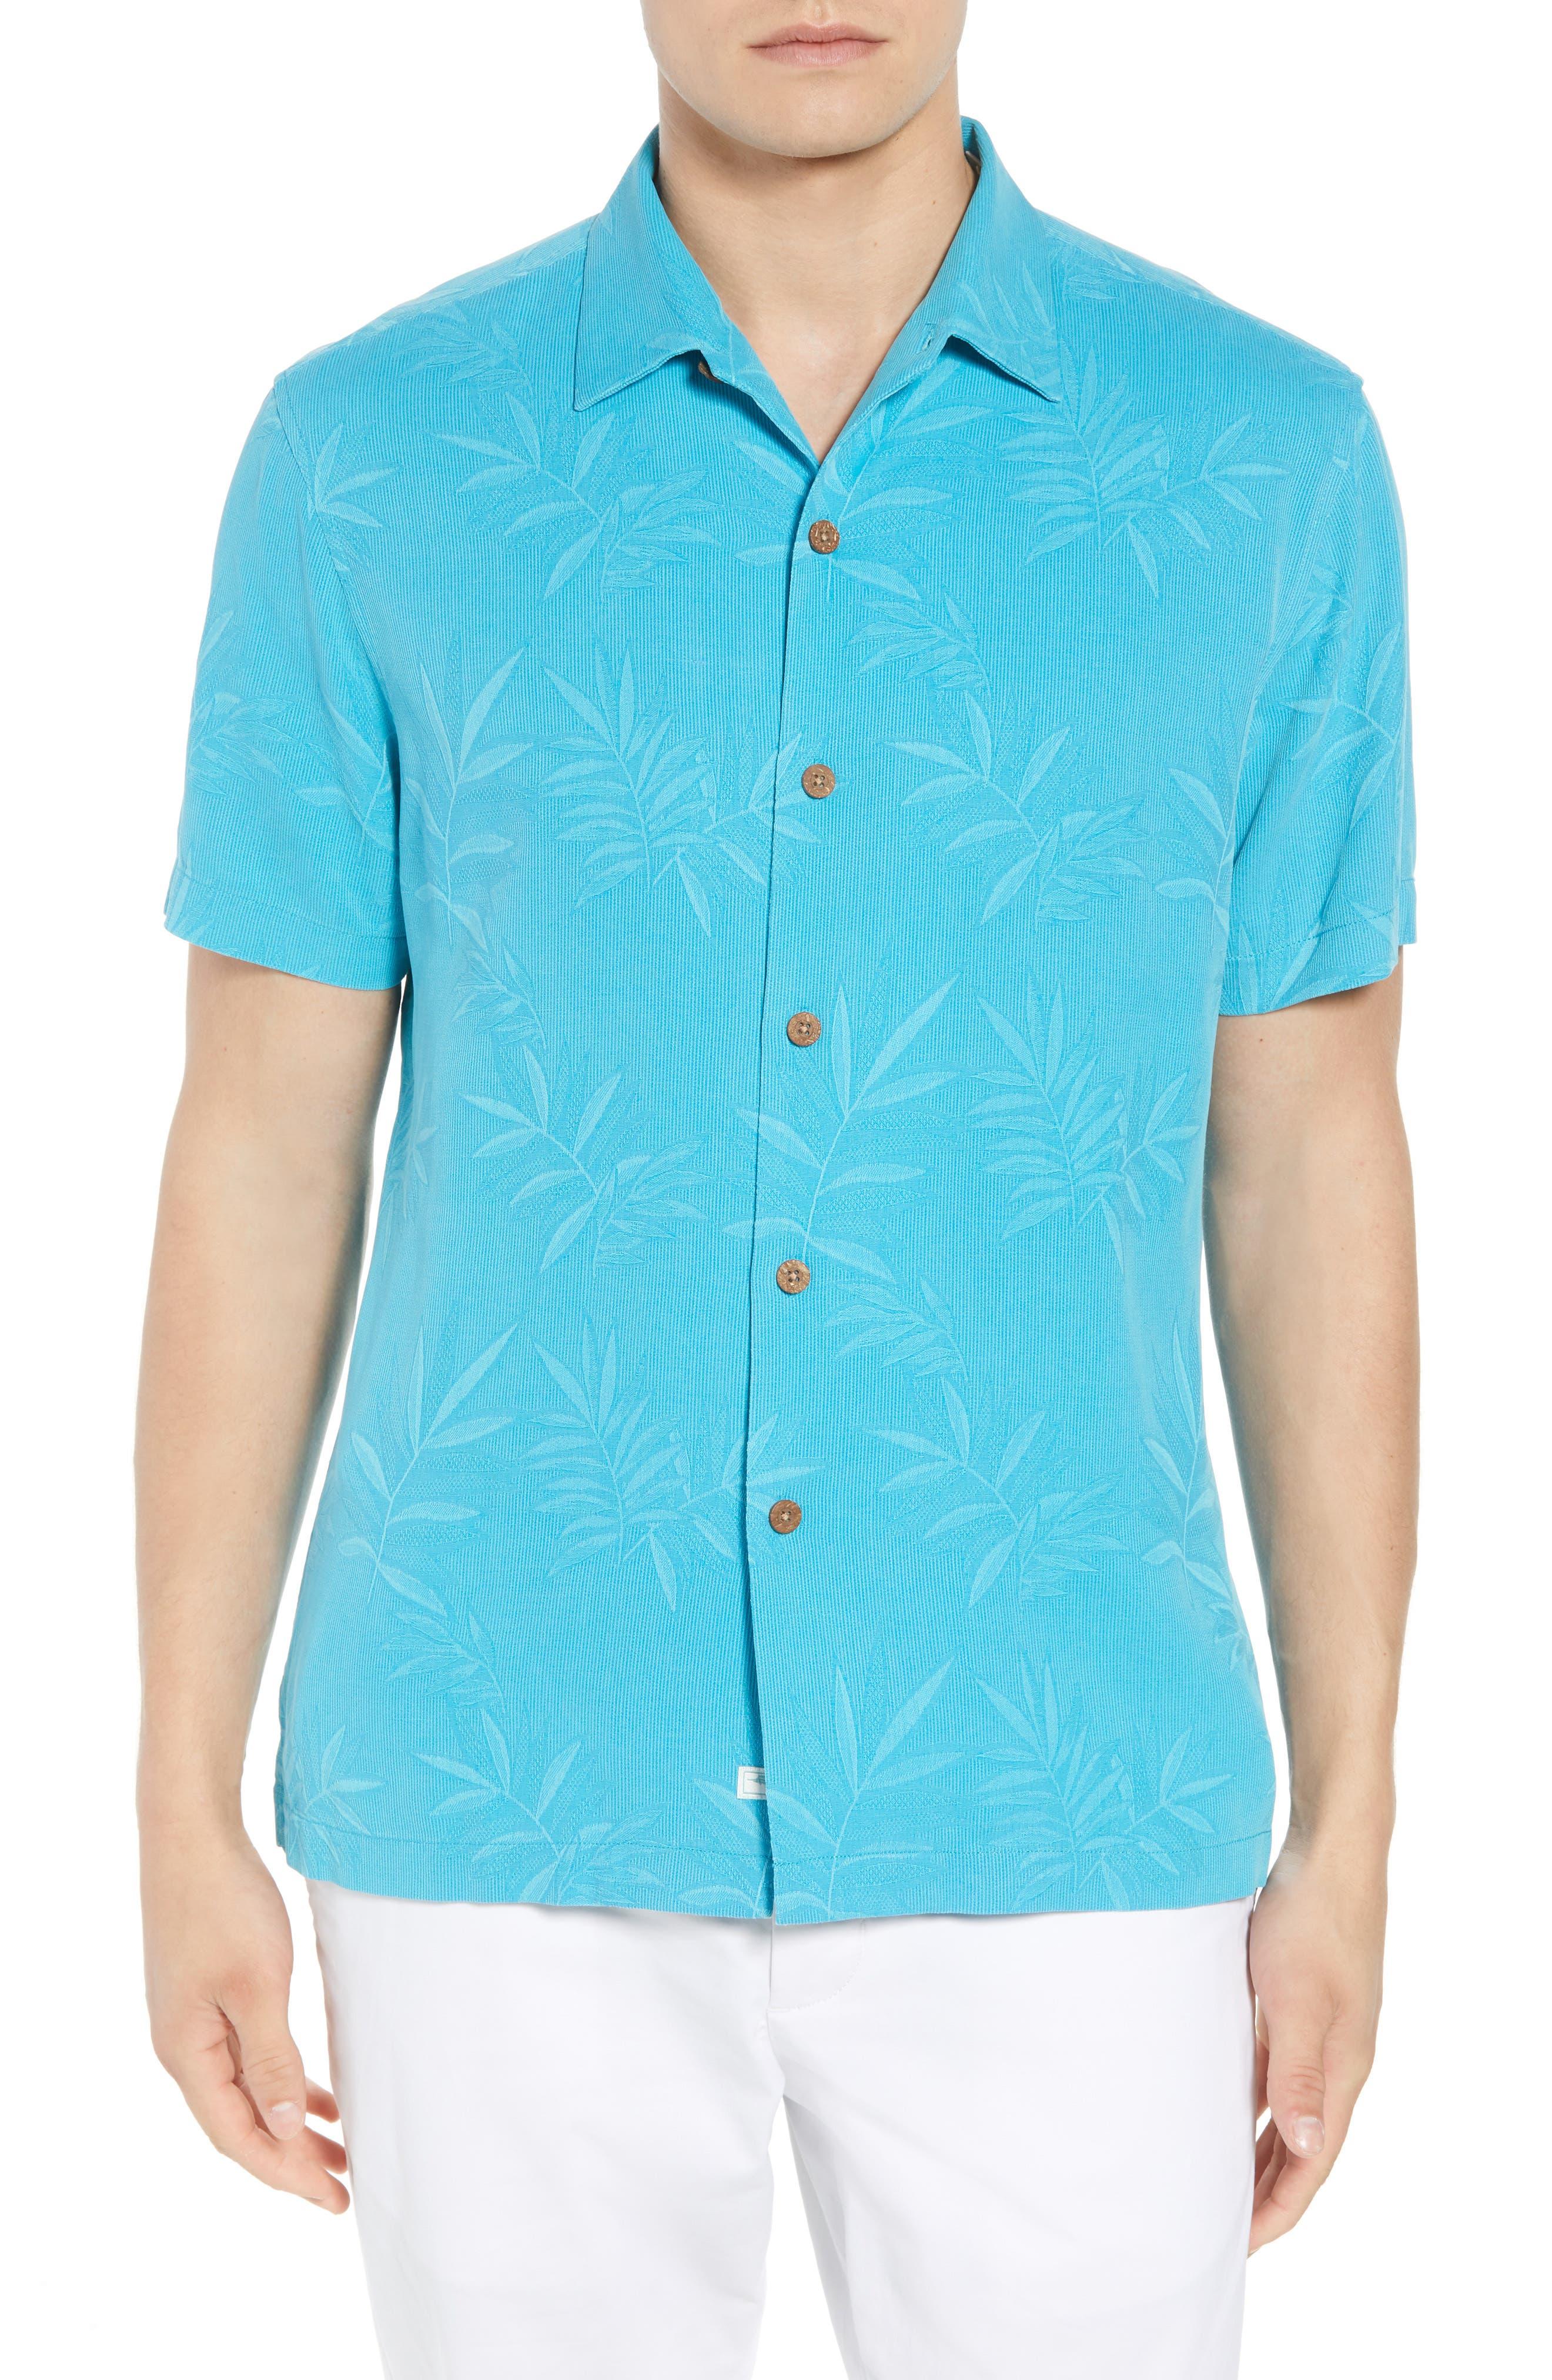 Luau Floral Silk Shirt,                         Main,                         color, Pool Party Blue